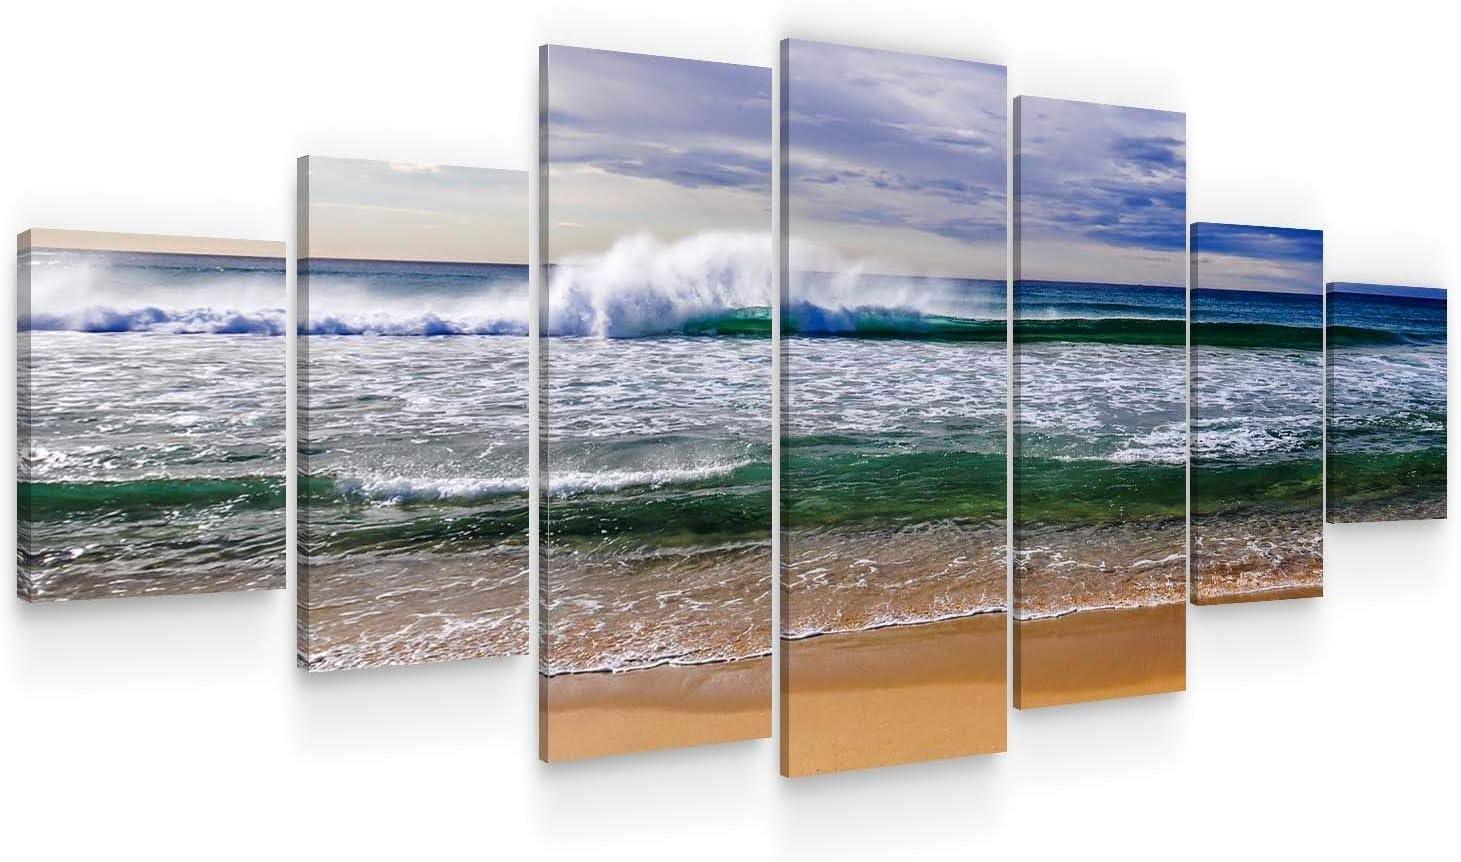 Startonight Huge Canvas Wall Art - Ocean Waves Large Framed Set of 7 40